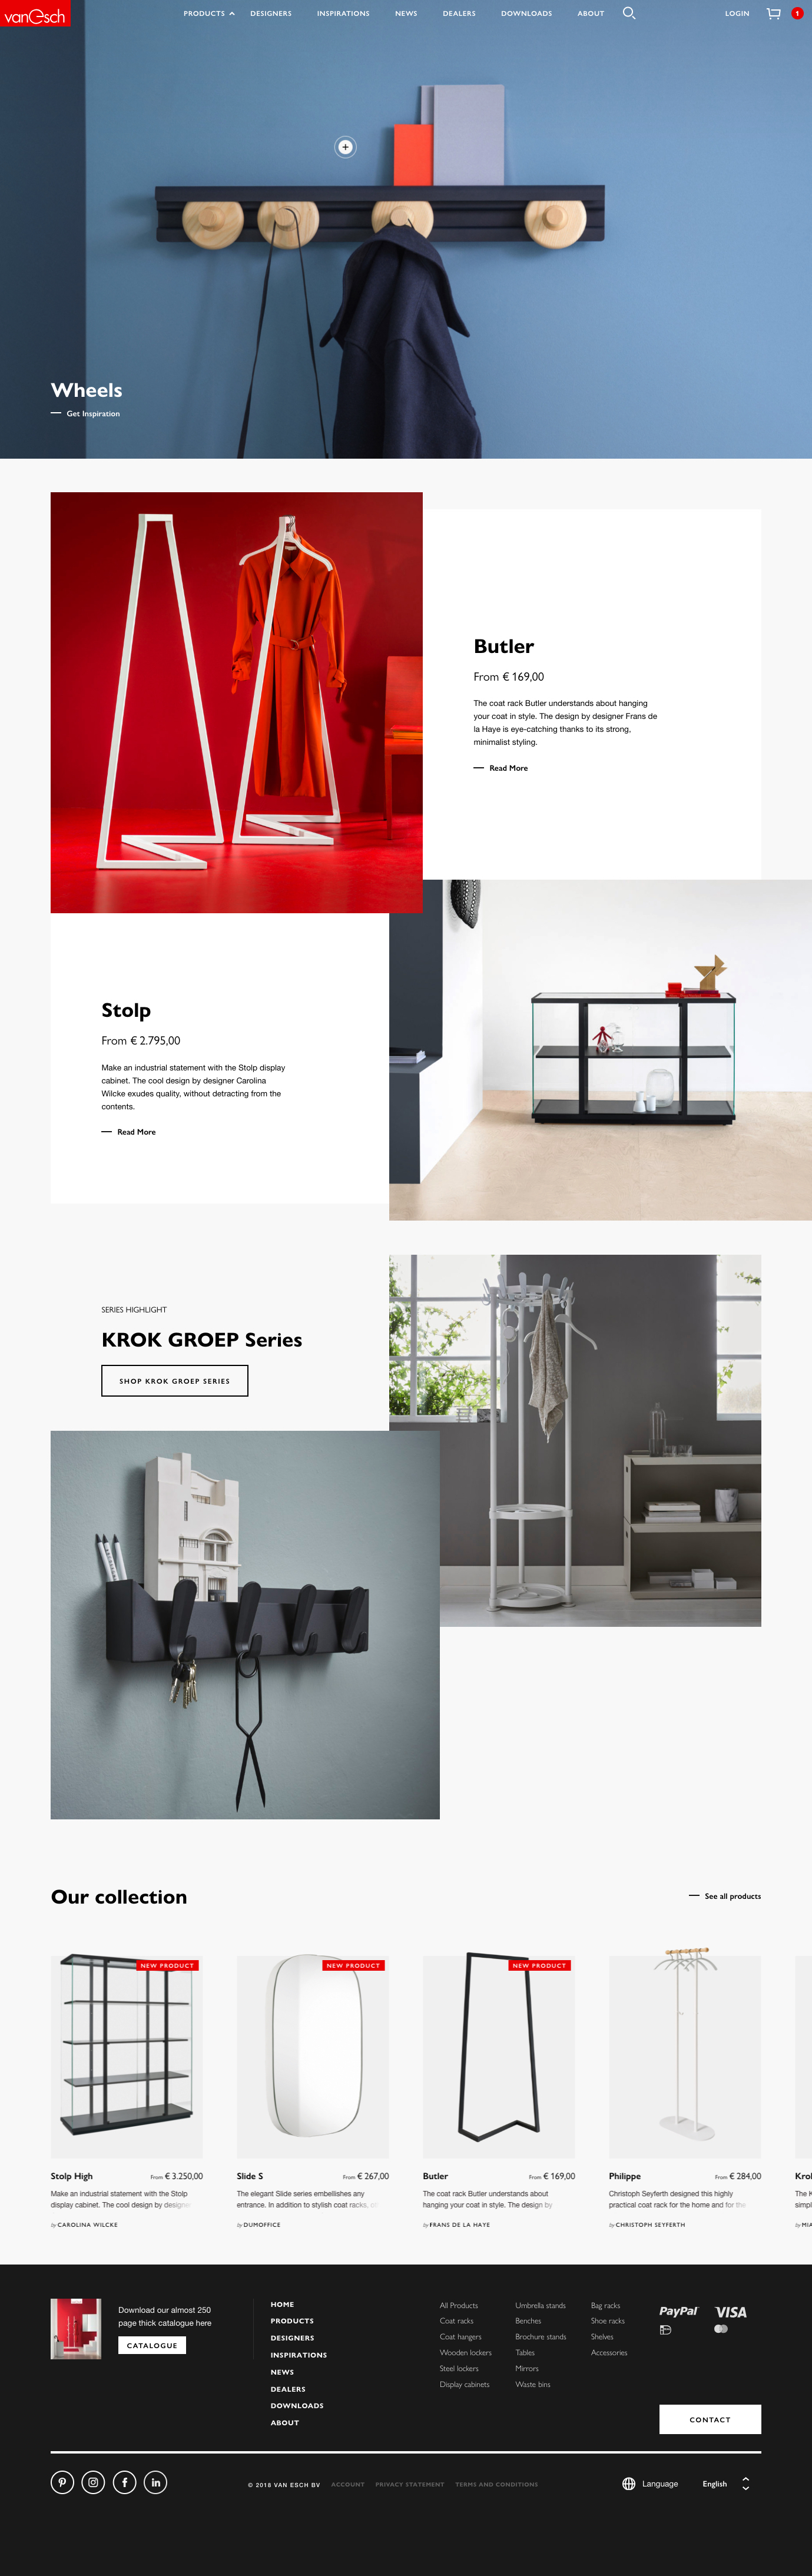 Van Esch product page